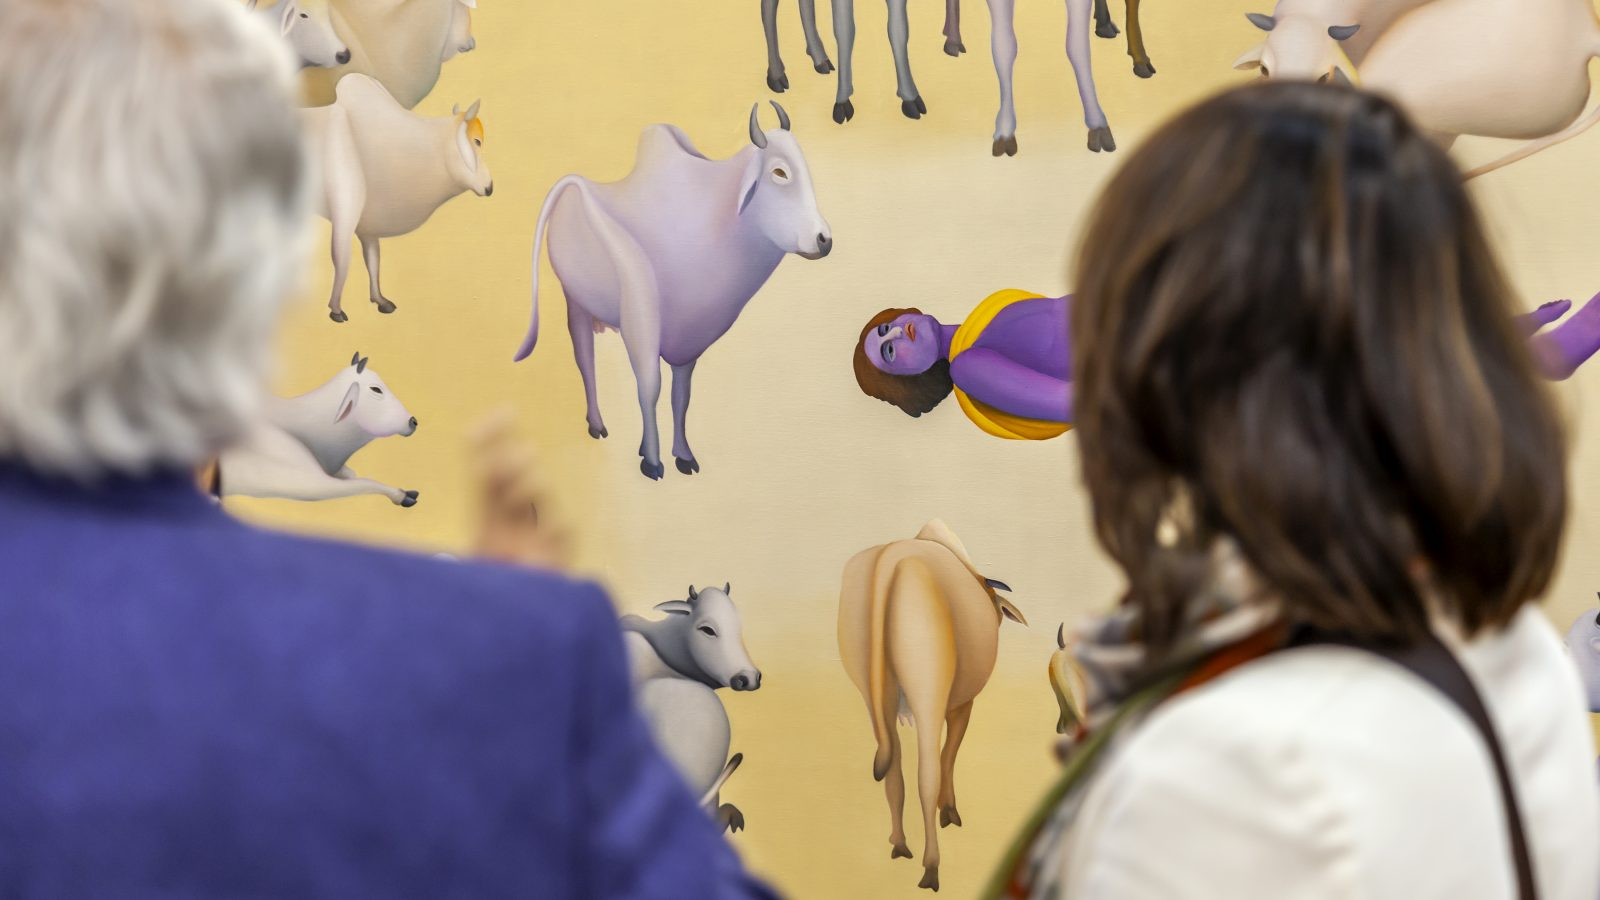 India Art Fair 14. Photo credit, Jeetin Sharma. Courtesy of India Art Fair